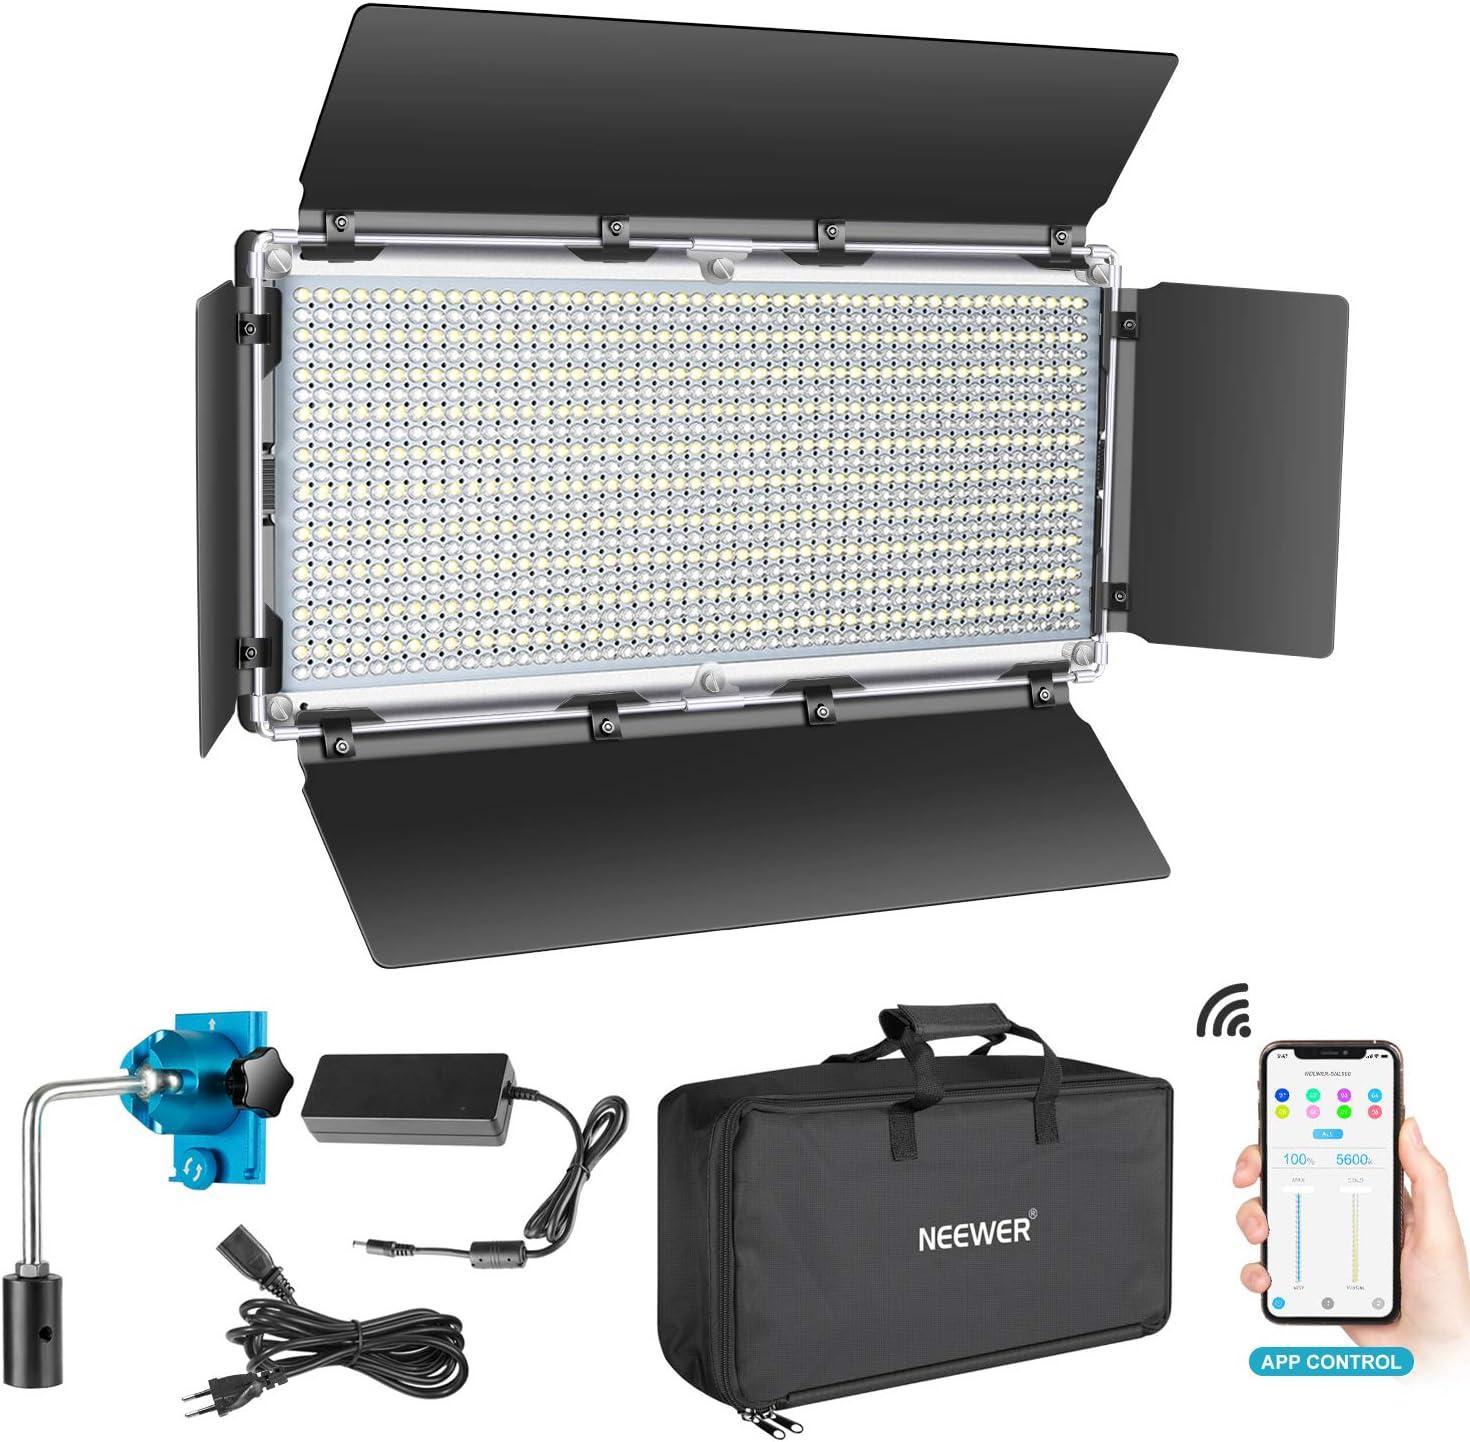 Neewer 960 LED Luz Video con Sistema de Control Inteligente App Kit de Iluminación LED de Fotografía Bicolor Regulable 3200K-5600K para Iluminación Video Exterior de Estudio Youtube con Pantalla LCD: Amazon.es: Electrónica